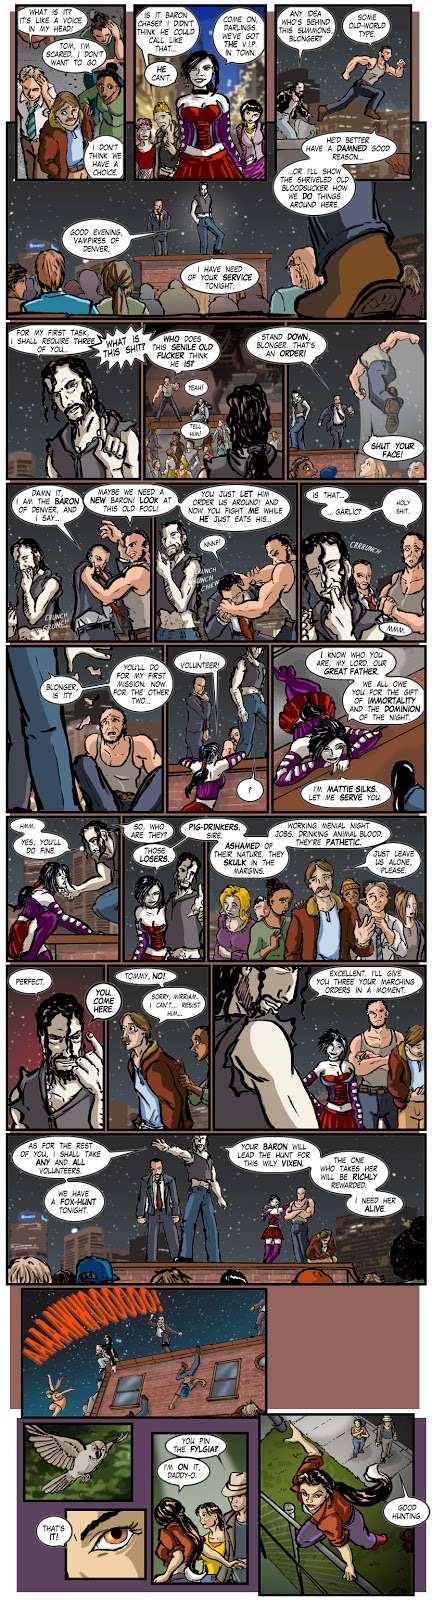 http://talesfromthevault.com/thunderstruck/comic703.html